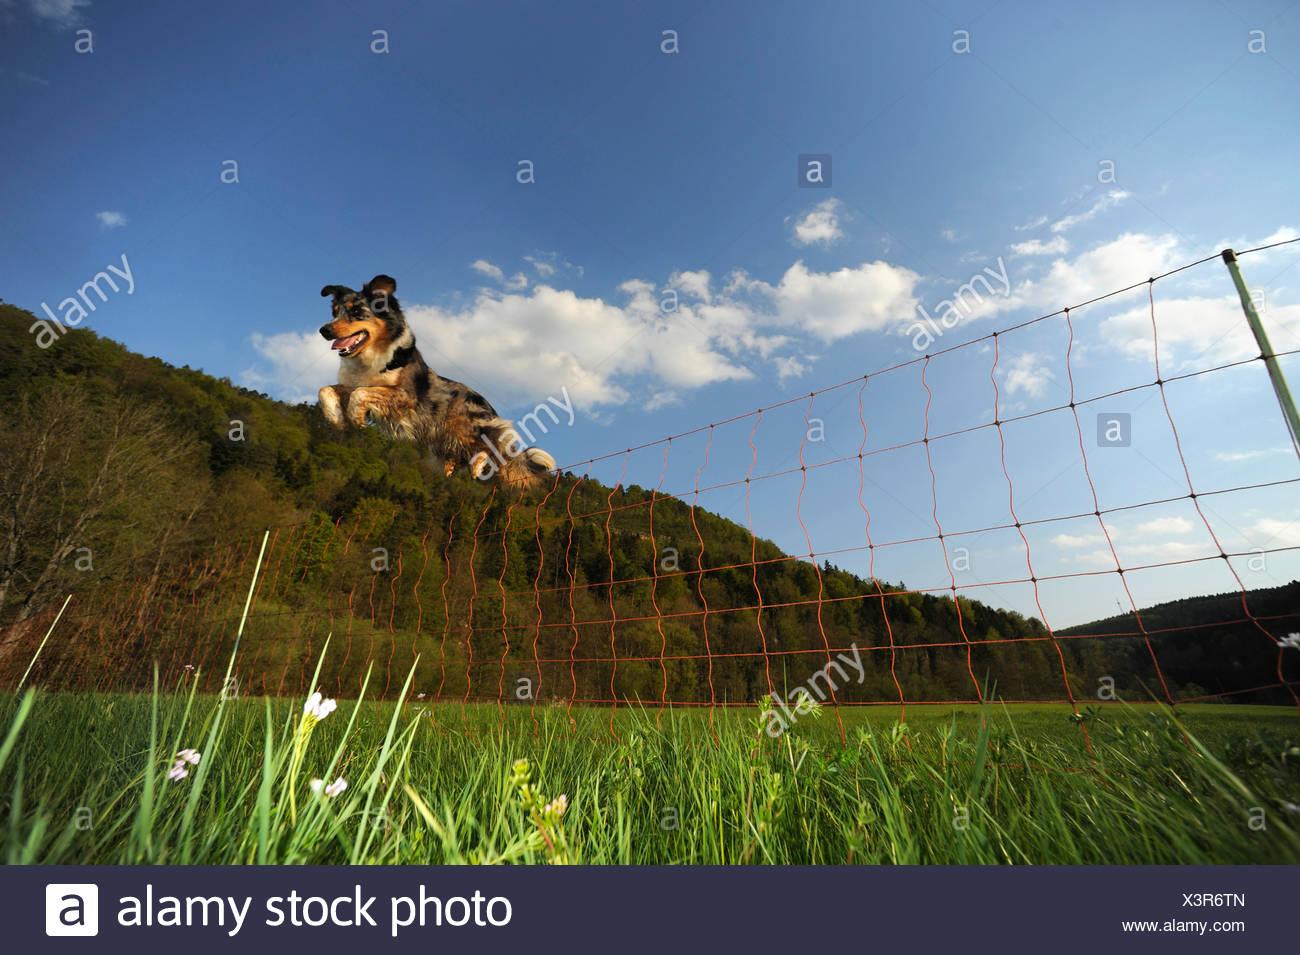 Dog Jump Fence Stock Photos & Dog Jump Fence Stock Images - Alamy